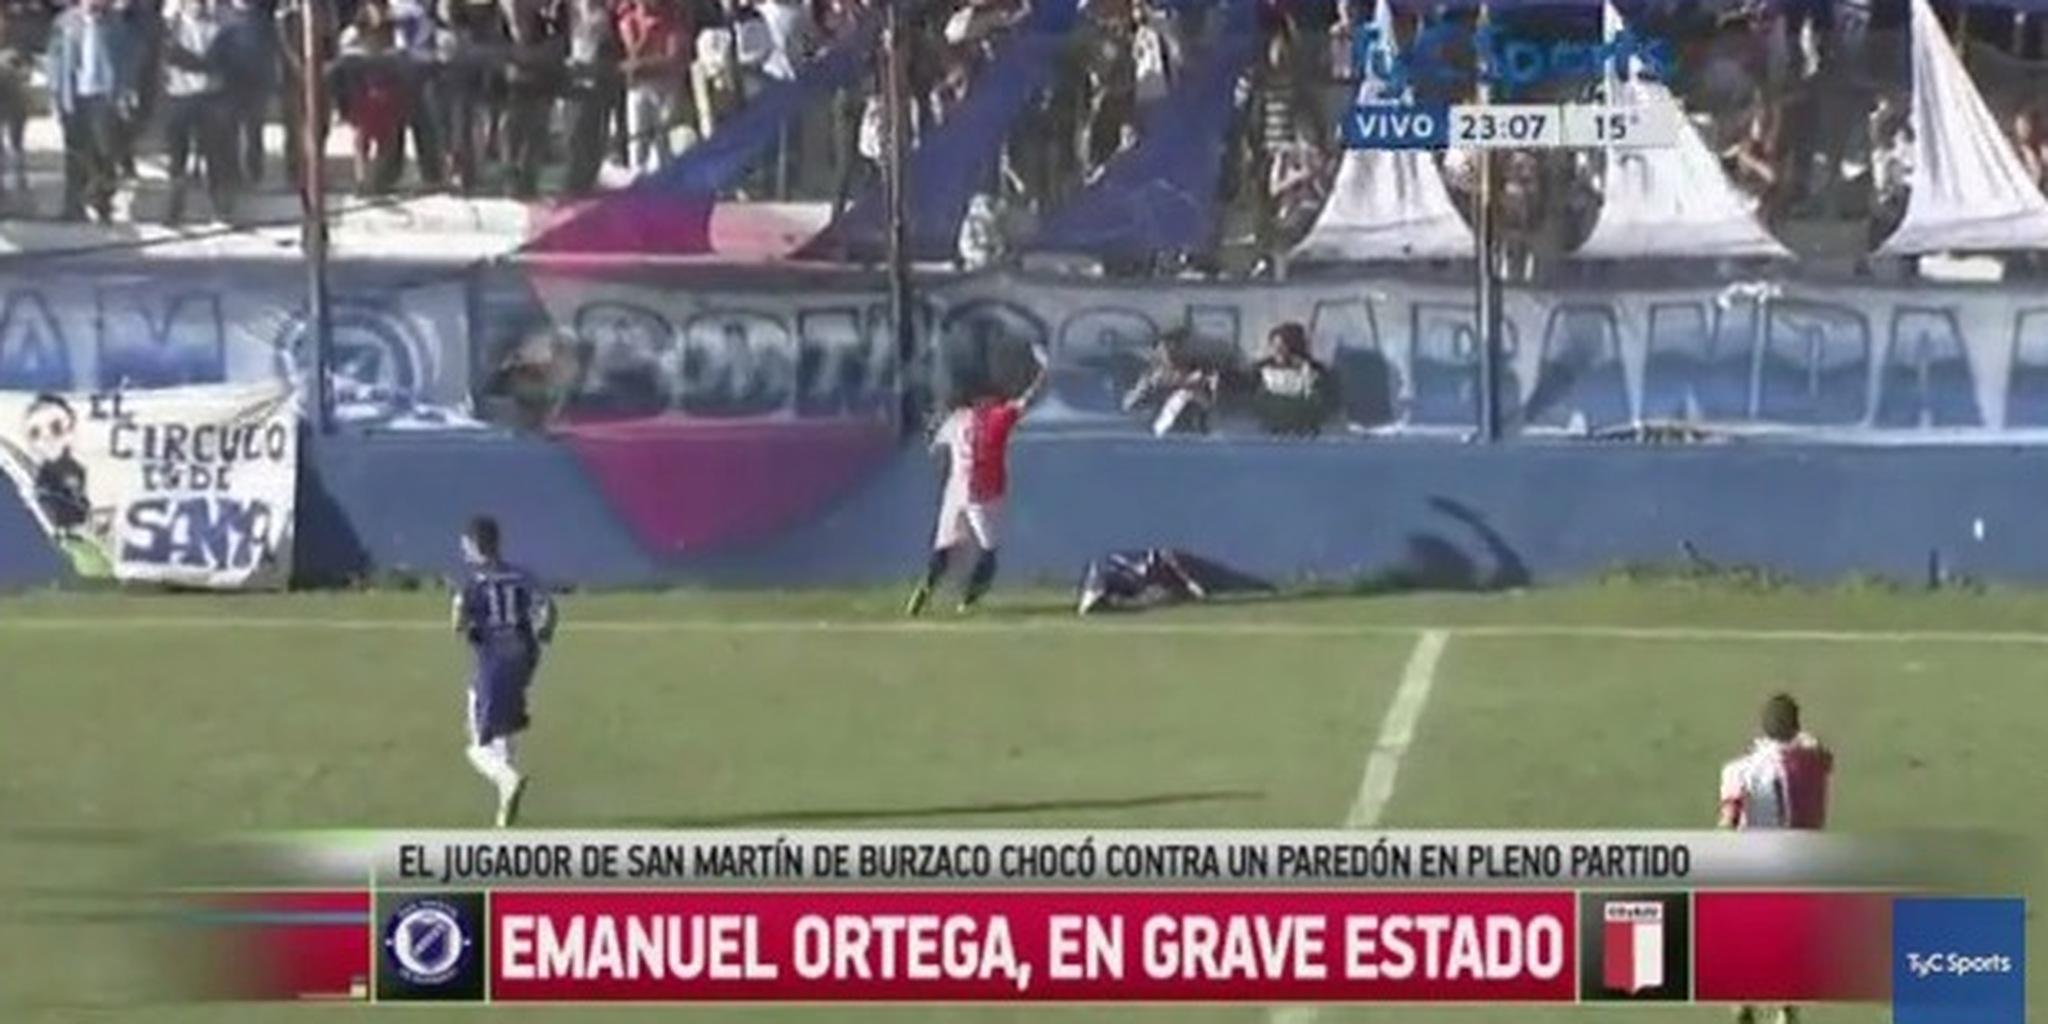 The death of Emanuel Ortega